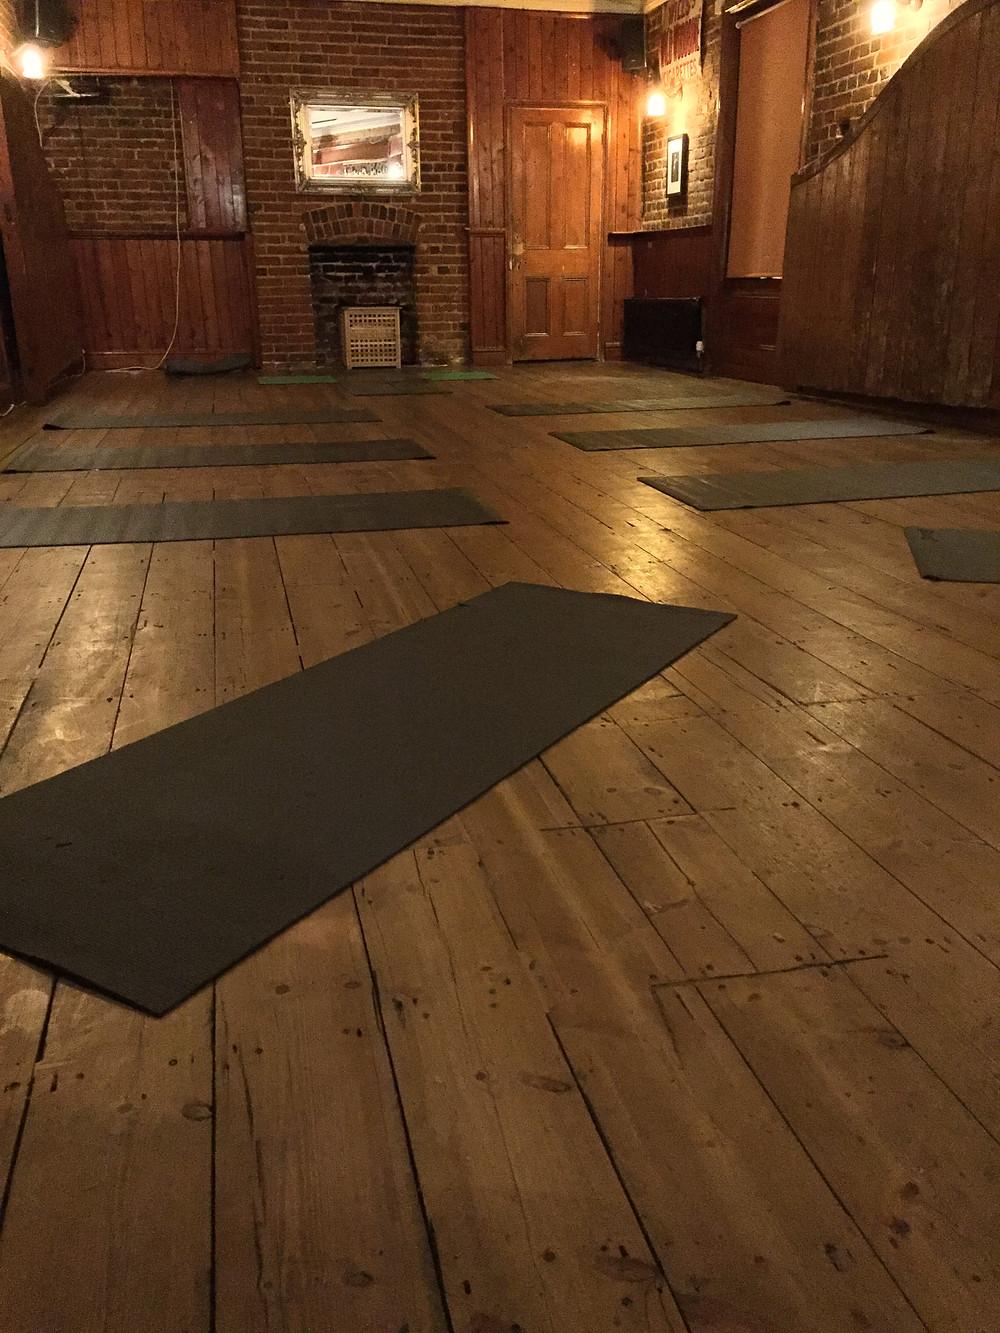 Yoga in the Tavern